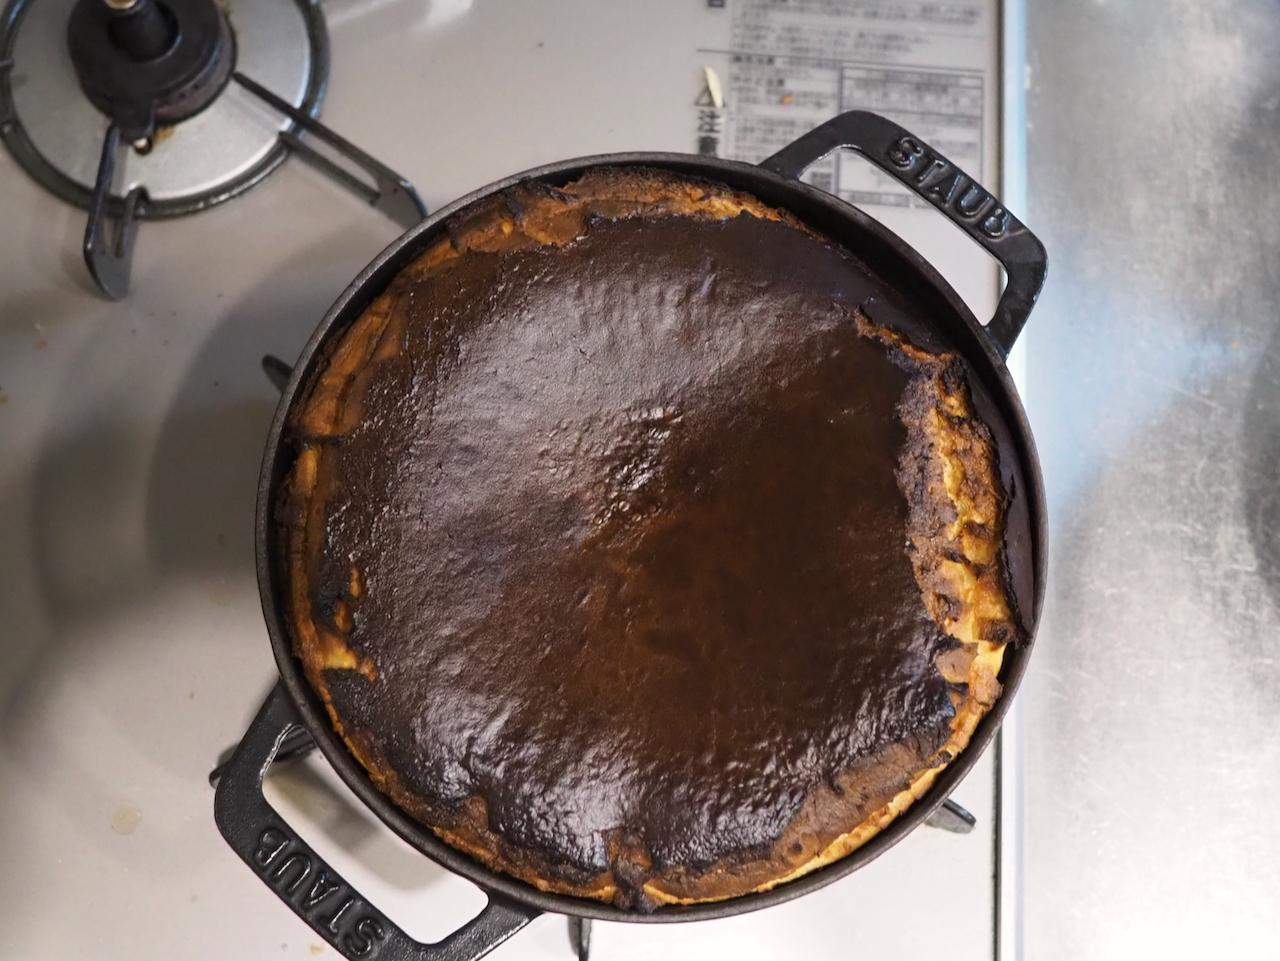 Basque_cheese_cake_2105-111.jpeg